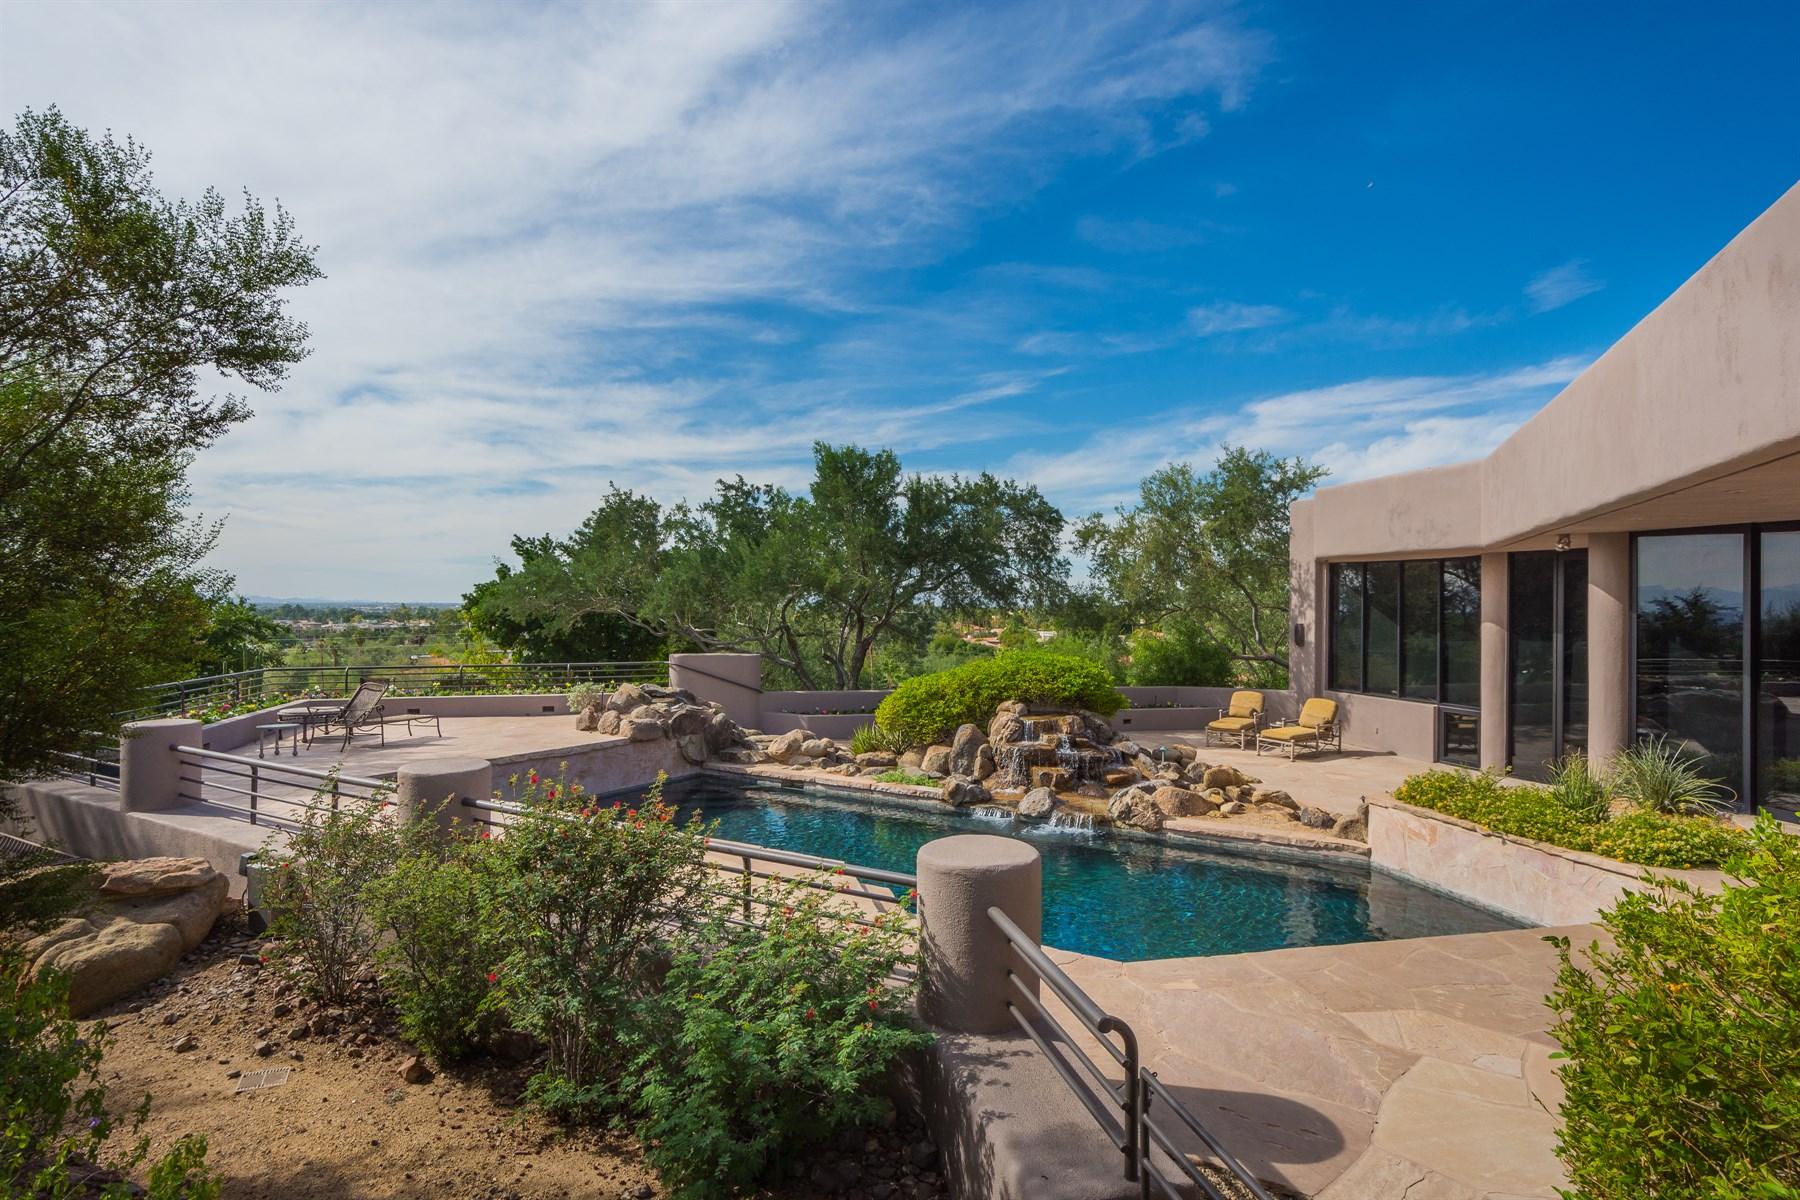 Single Family Home for Sale at Fantastic Executive Retreat Discreetly Tucked Into The Mountain 5913 N La Colina Drive Paradise Valley, Arizona, 85253 United States